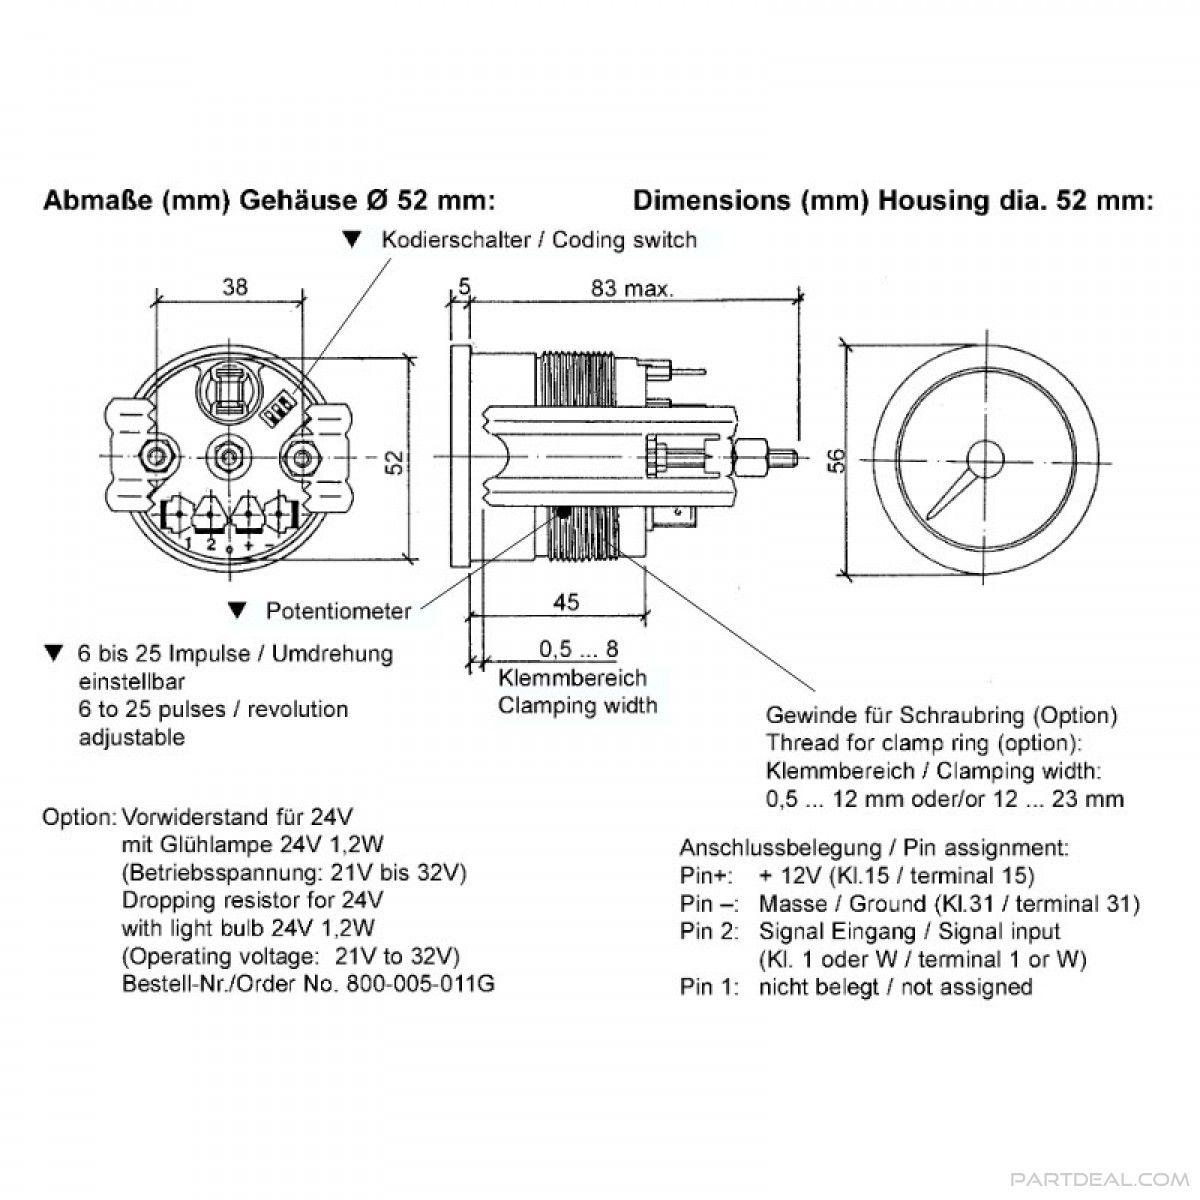 medium resolution of image result for vdo marine diesel tachometer wiring diagram